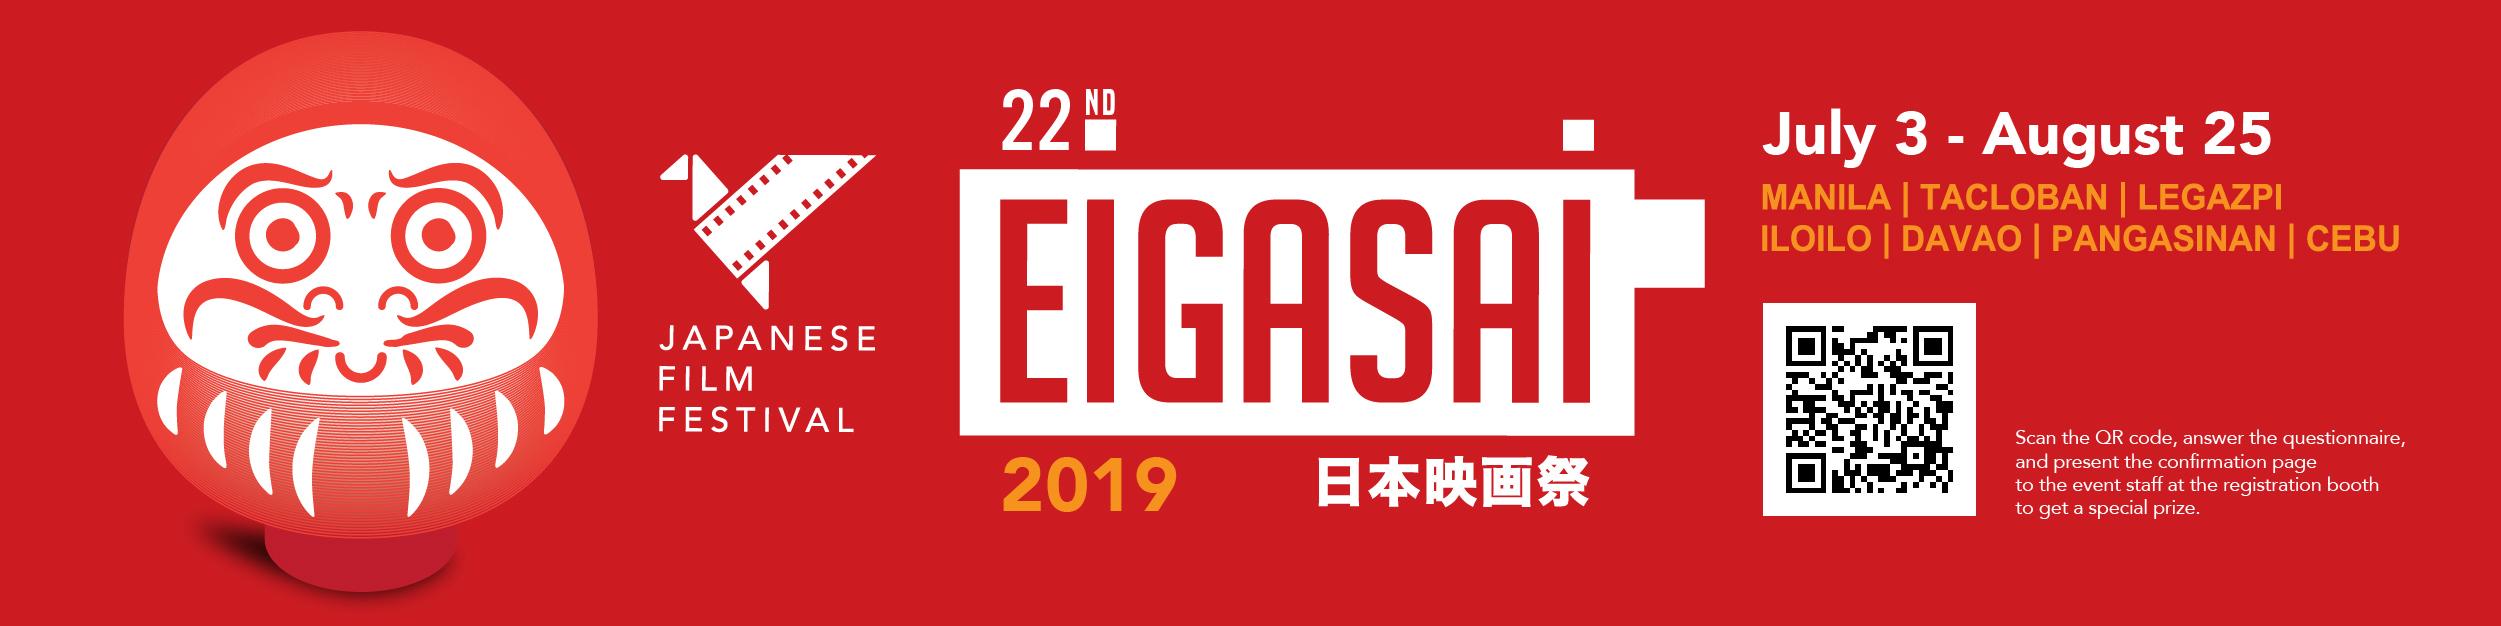 THE JAPANESE FILM FESTIVAL | EIGASAI 2019